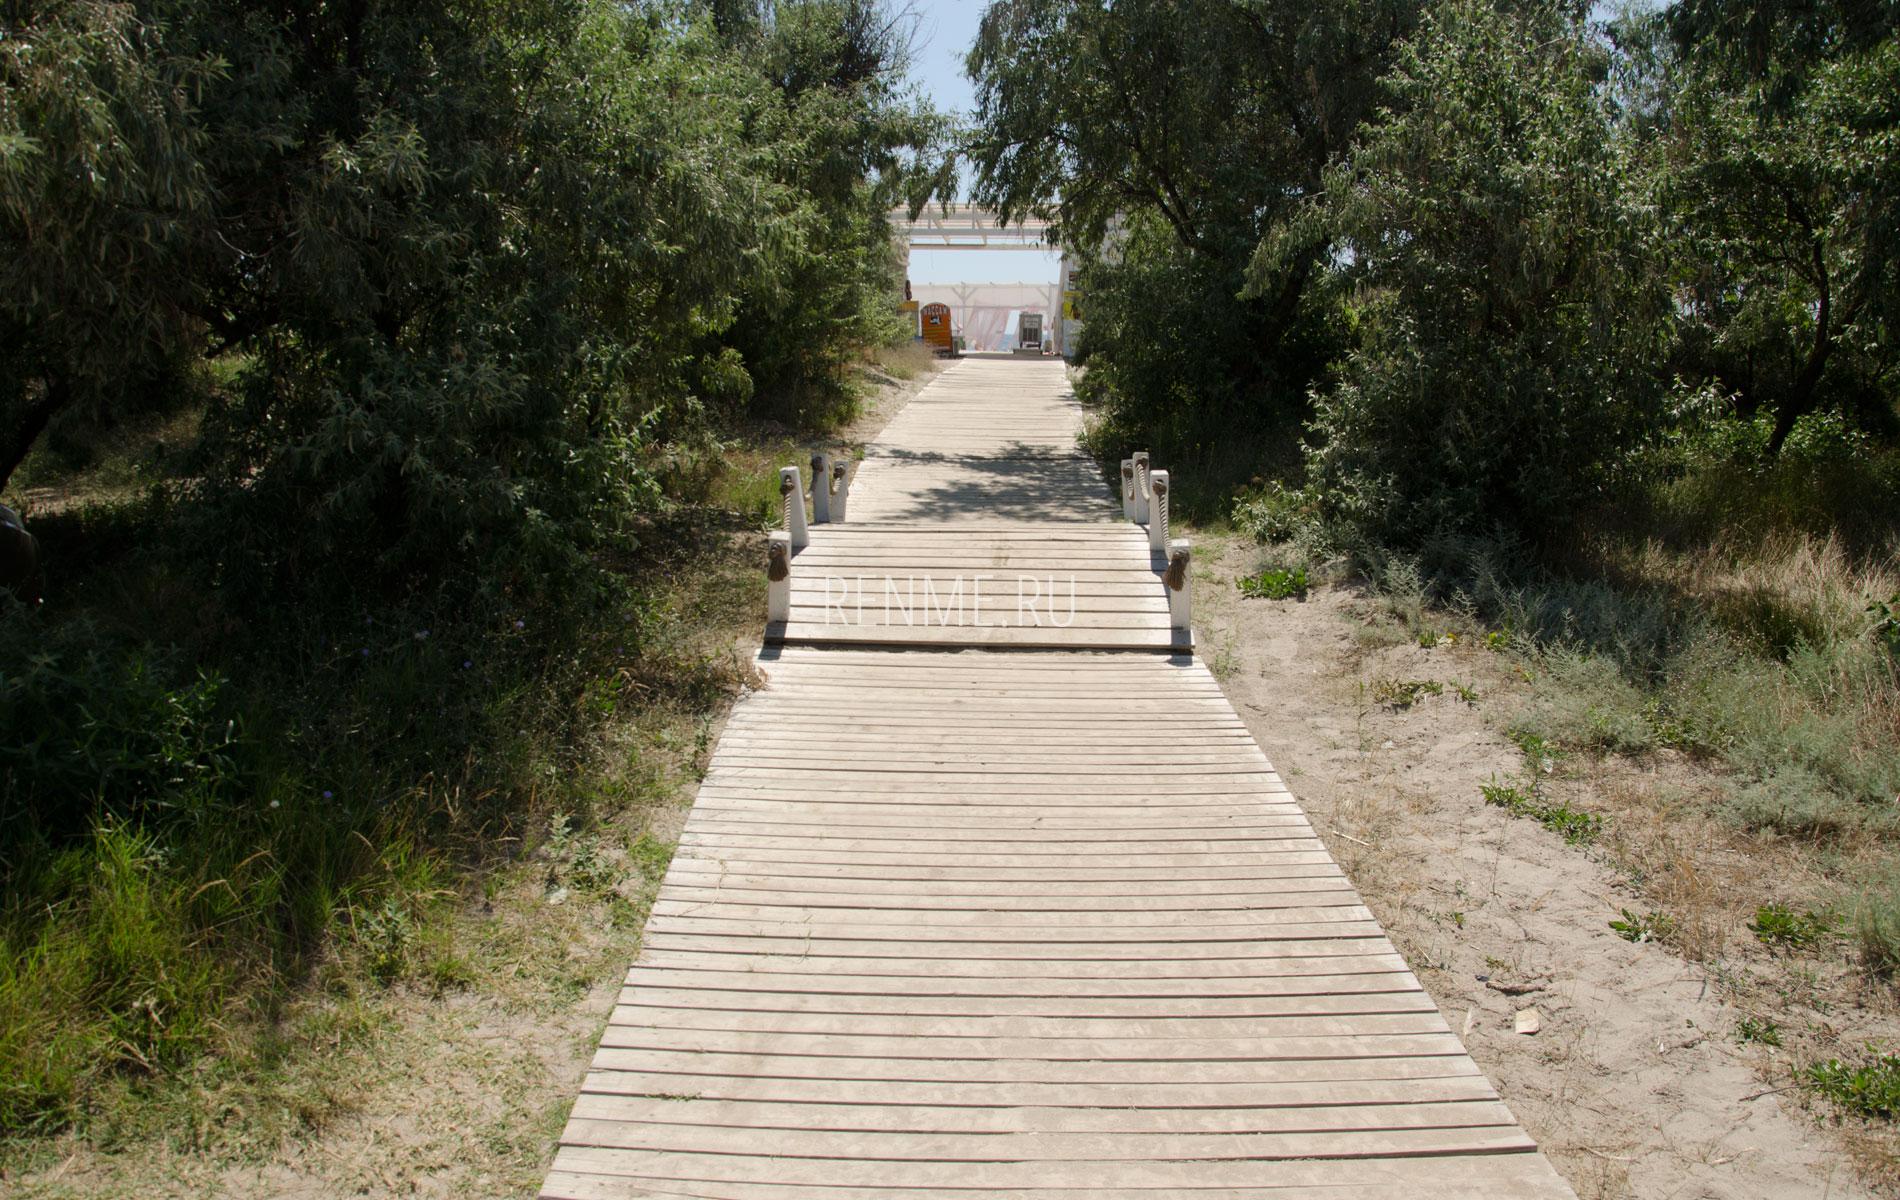 Дорожка к пляжу Краб. Фото Штормового